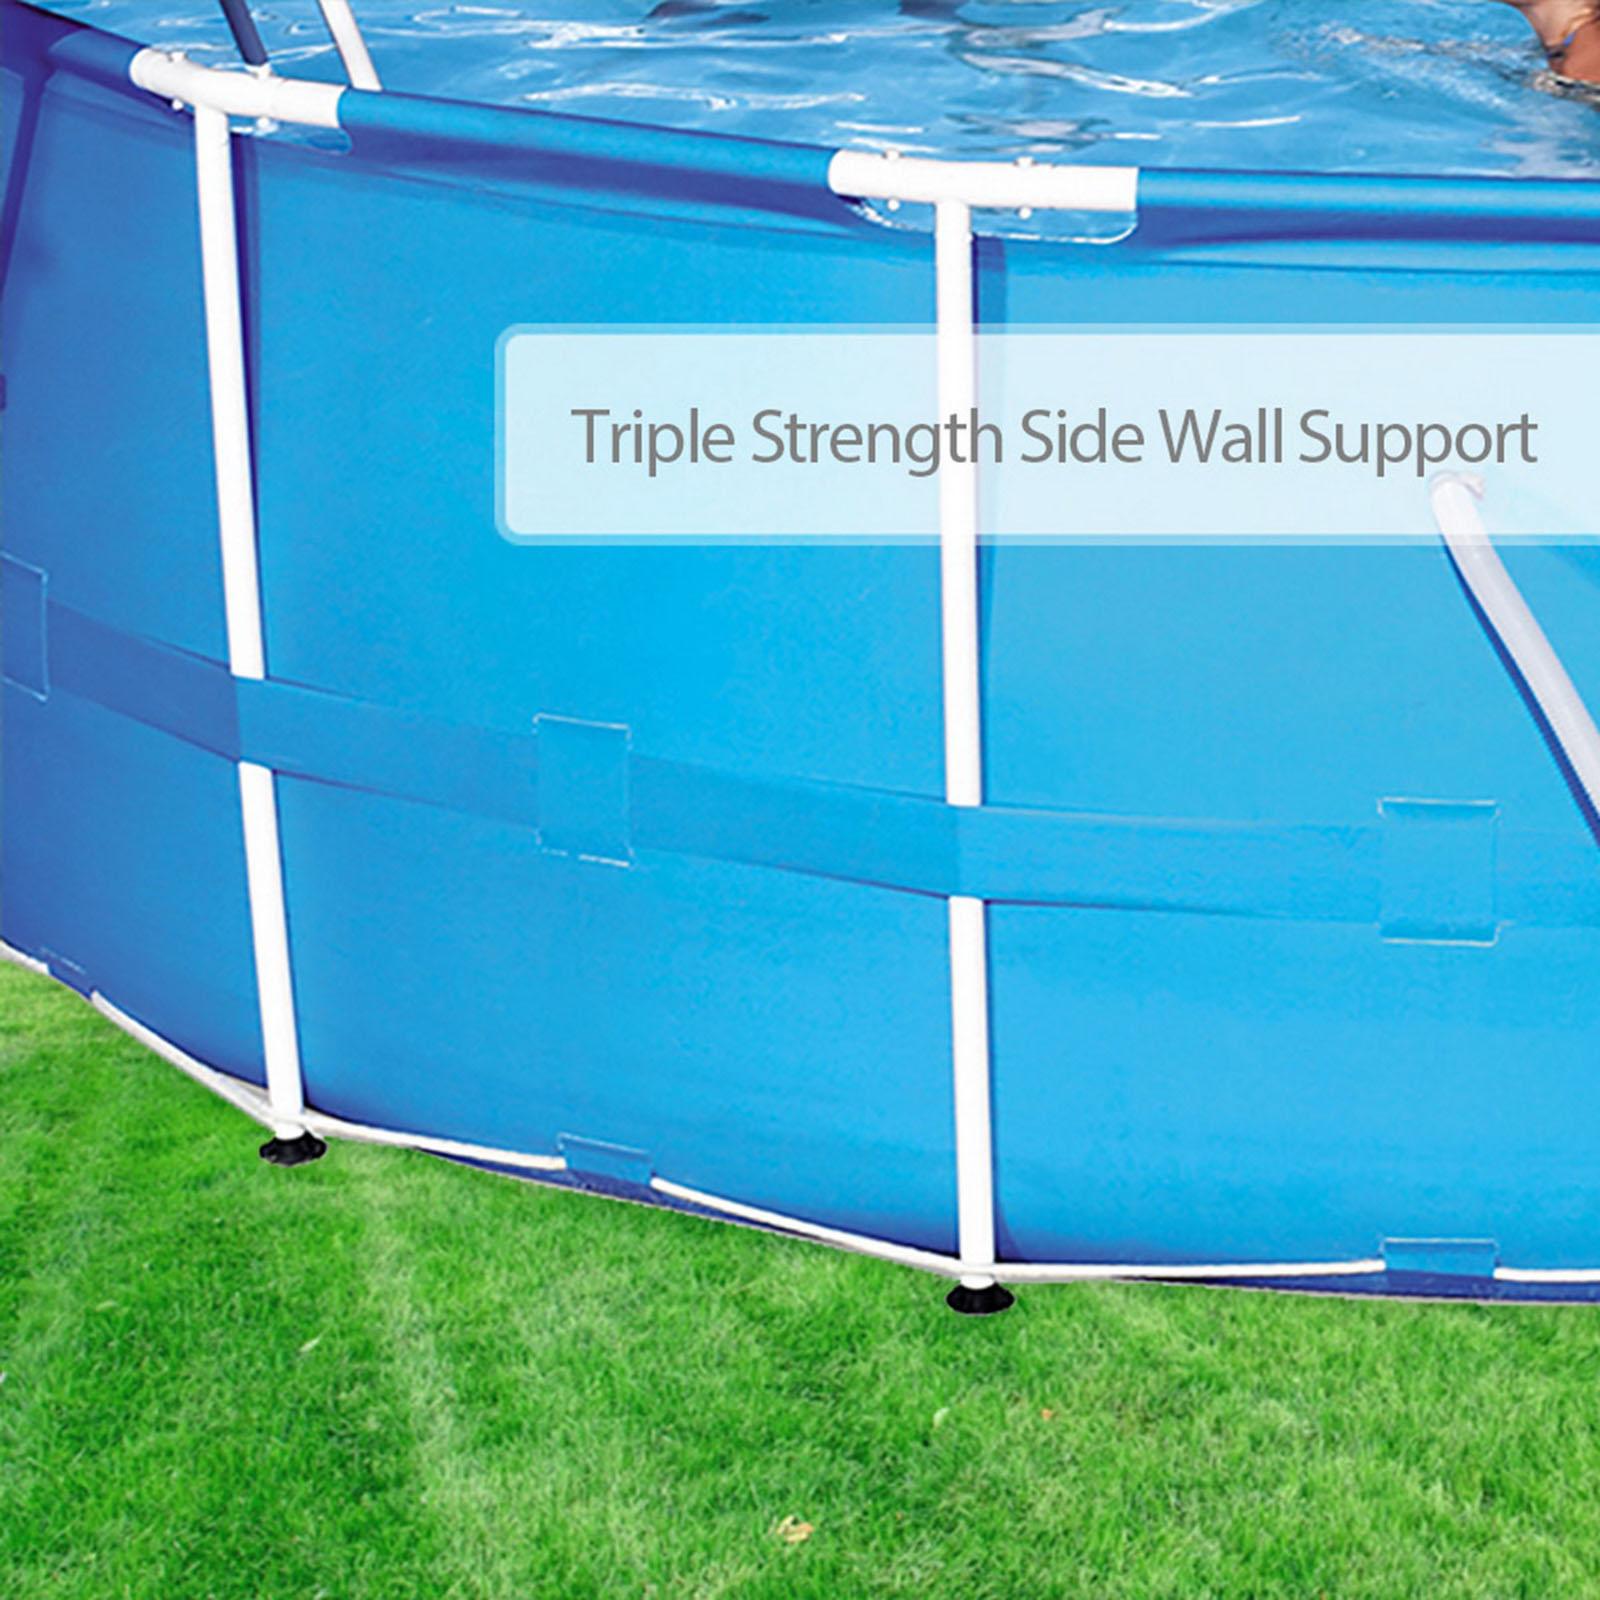 NEW BESTWAY ABOVE GROUND SWIMMING POOL Steel Frame Filter Pump 56439 ...